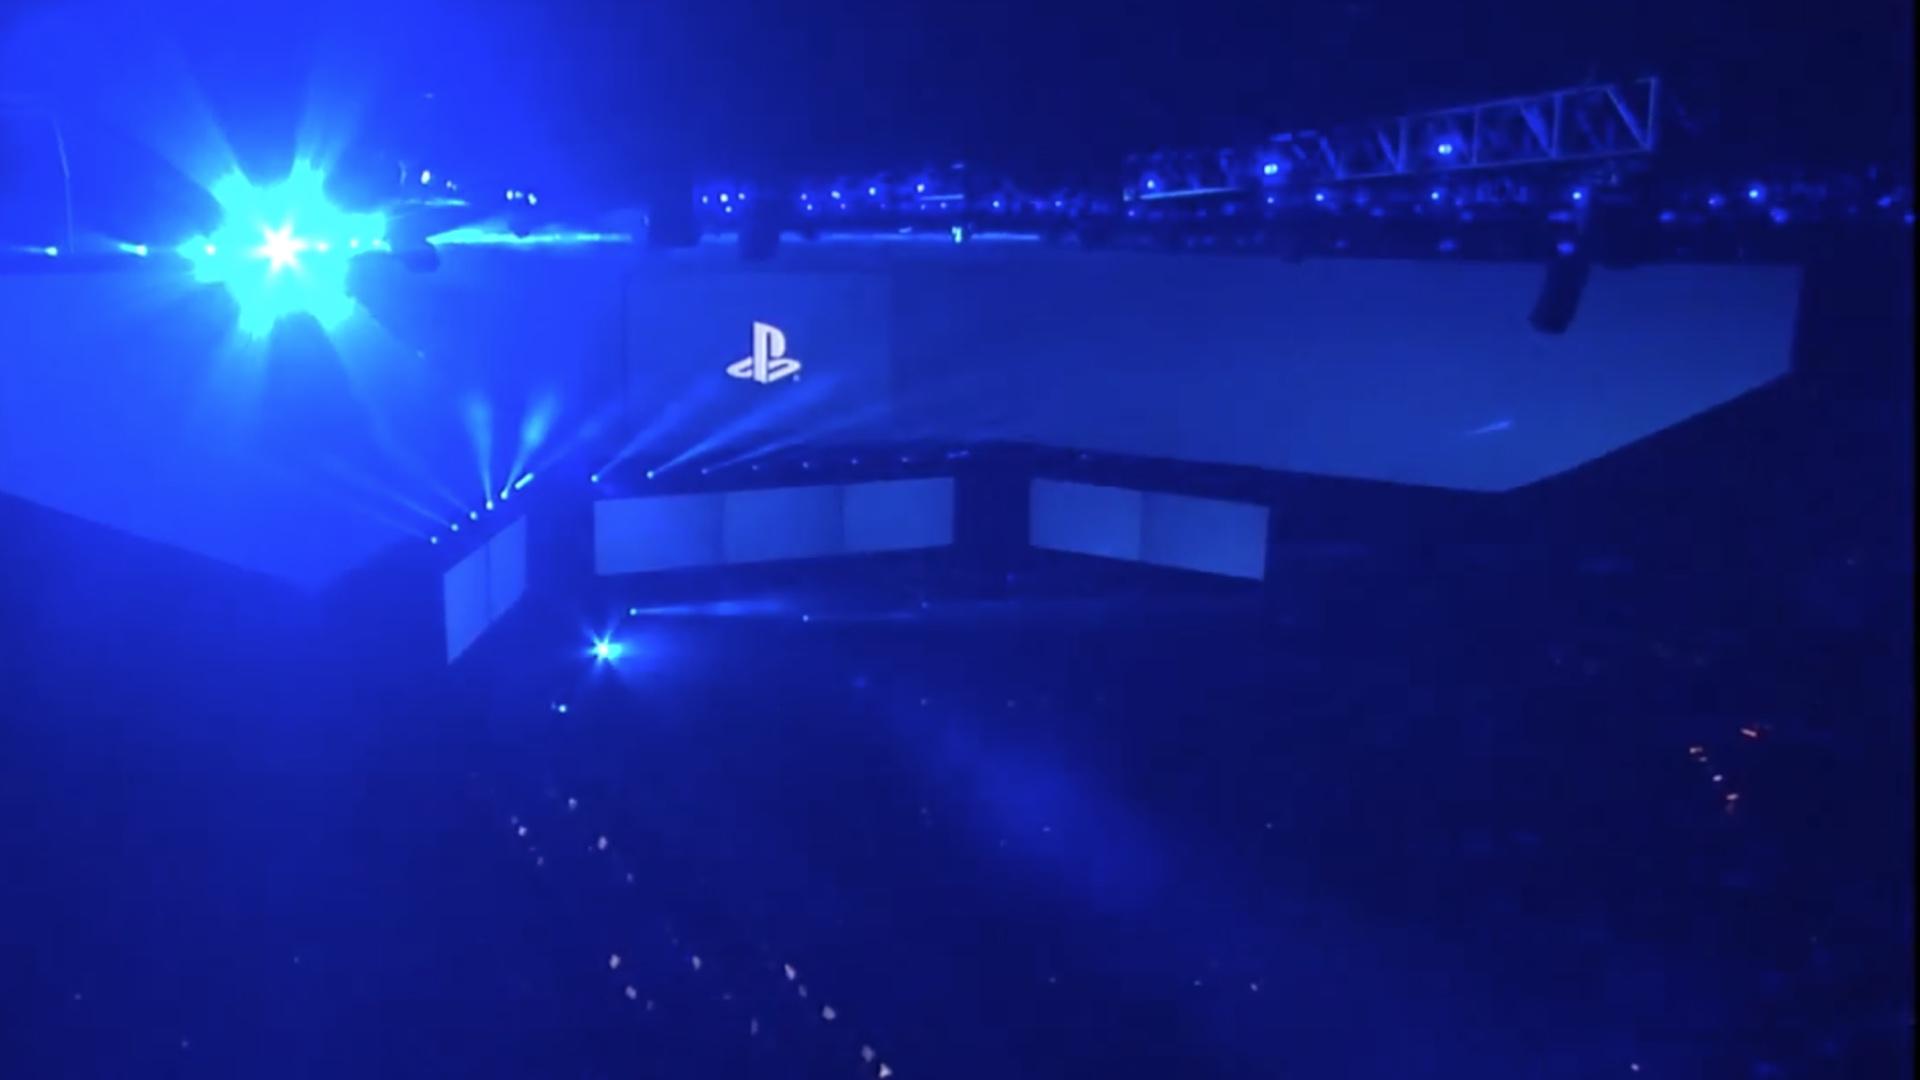 PS4 E3 2015 Playstation Experience